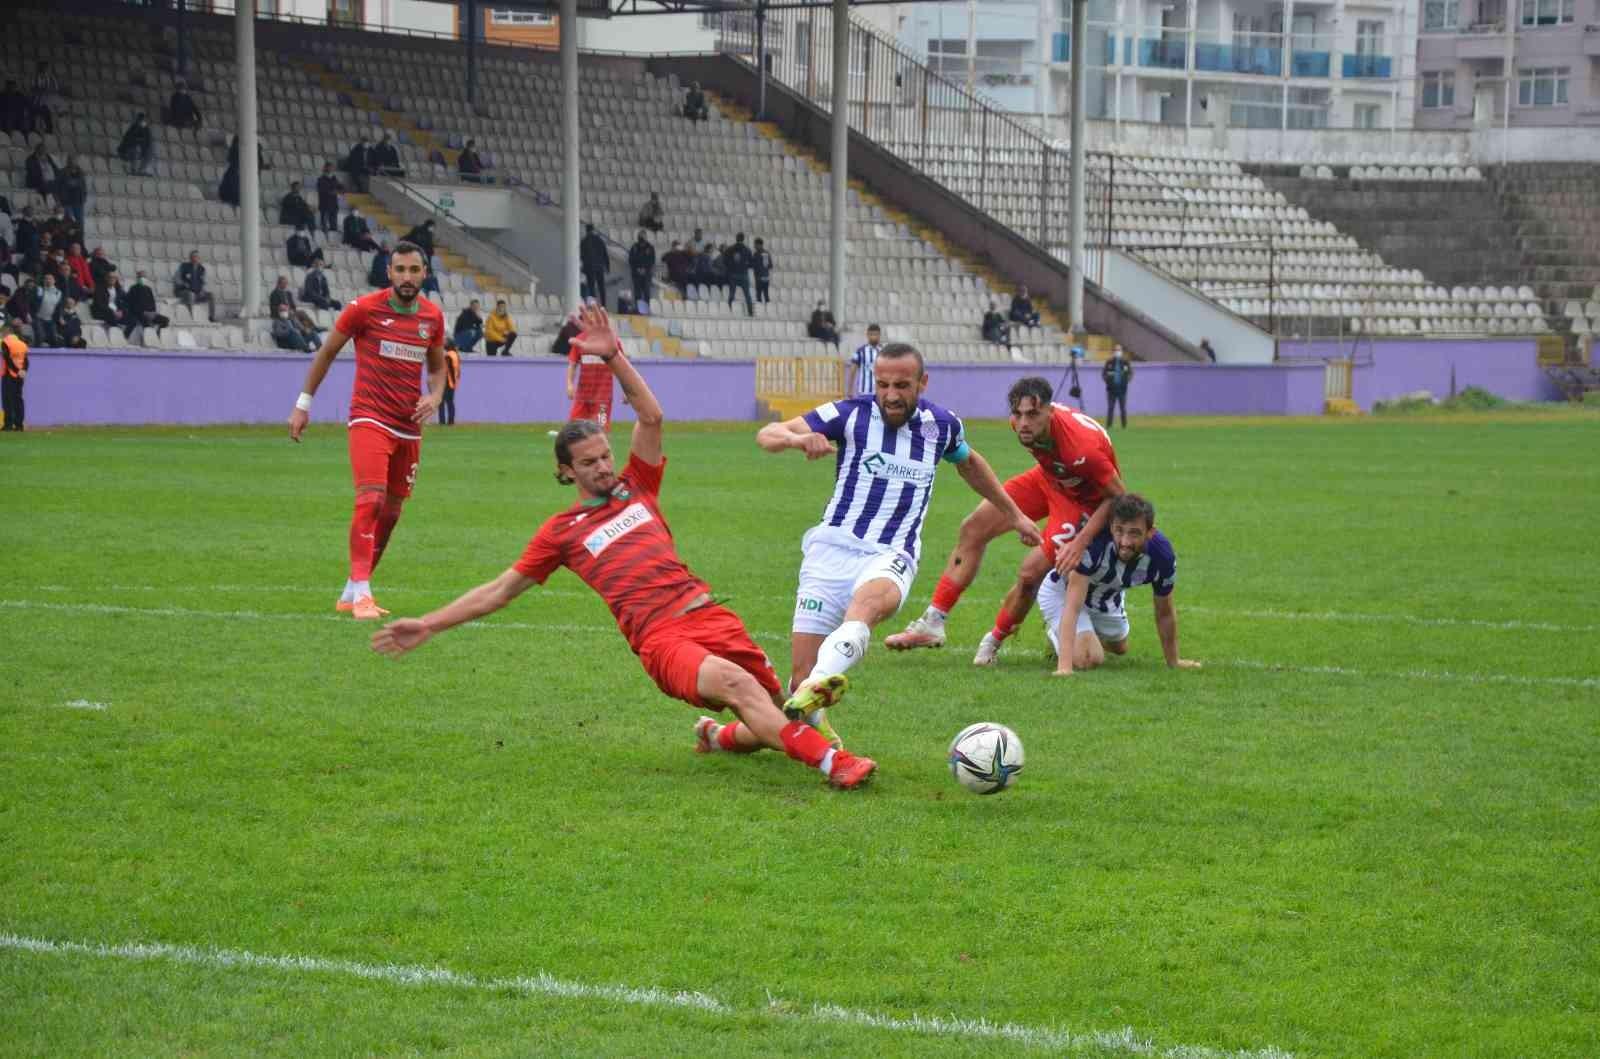 TFF 3. Lig: 52 Orduspor FK: 0 – Bayrampaşa: 0